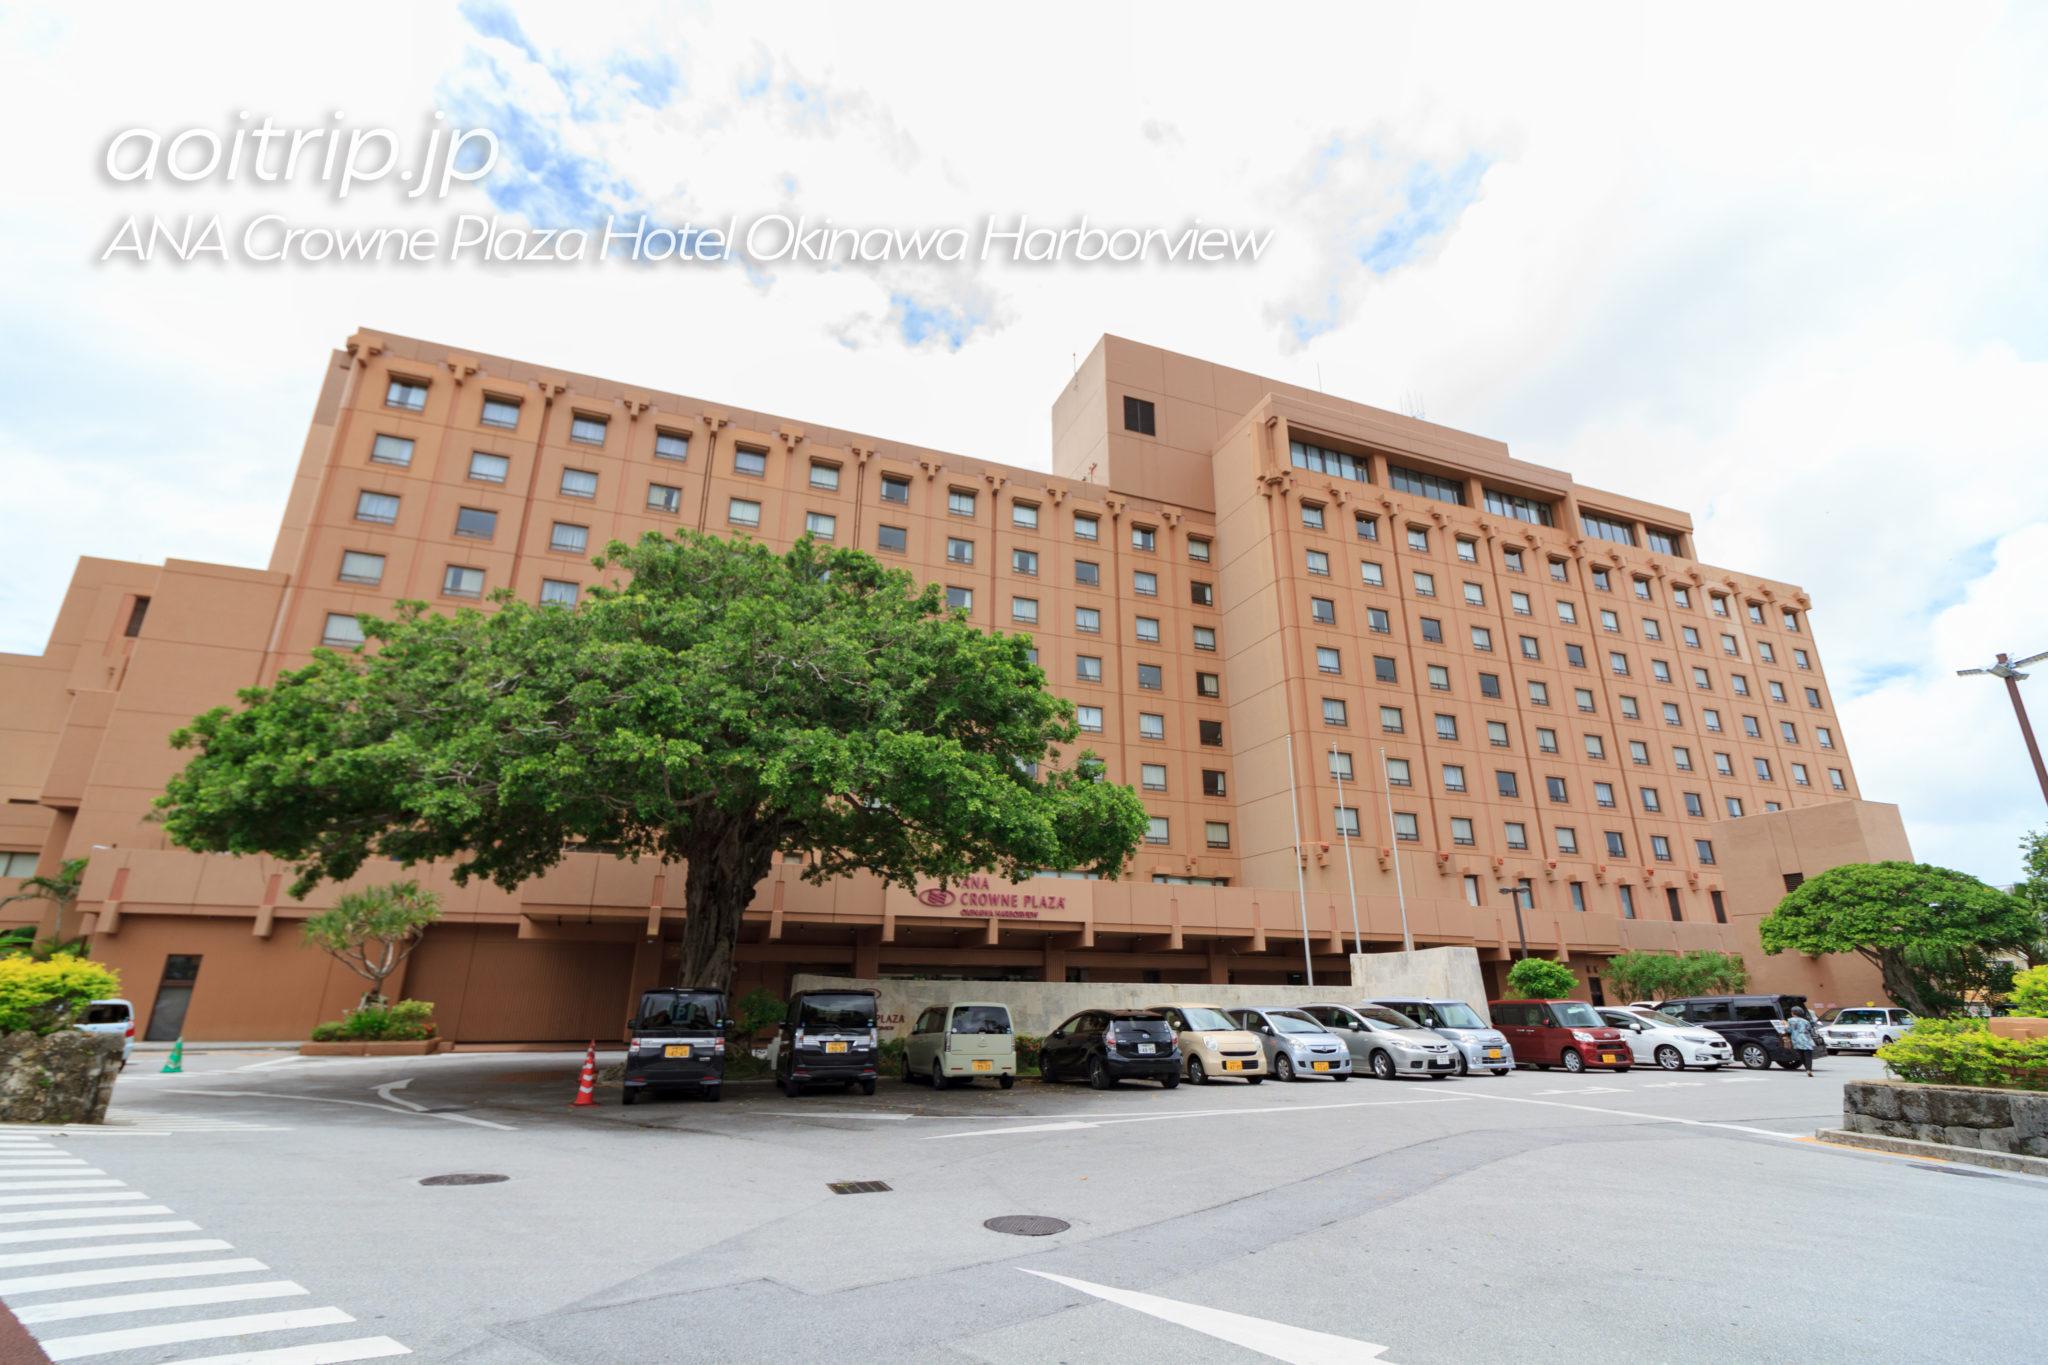 ANAクラウンプラザホテル沖縄ハーバービューのホテル外観